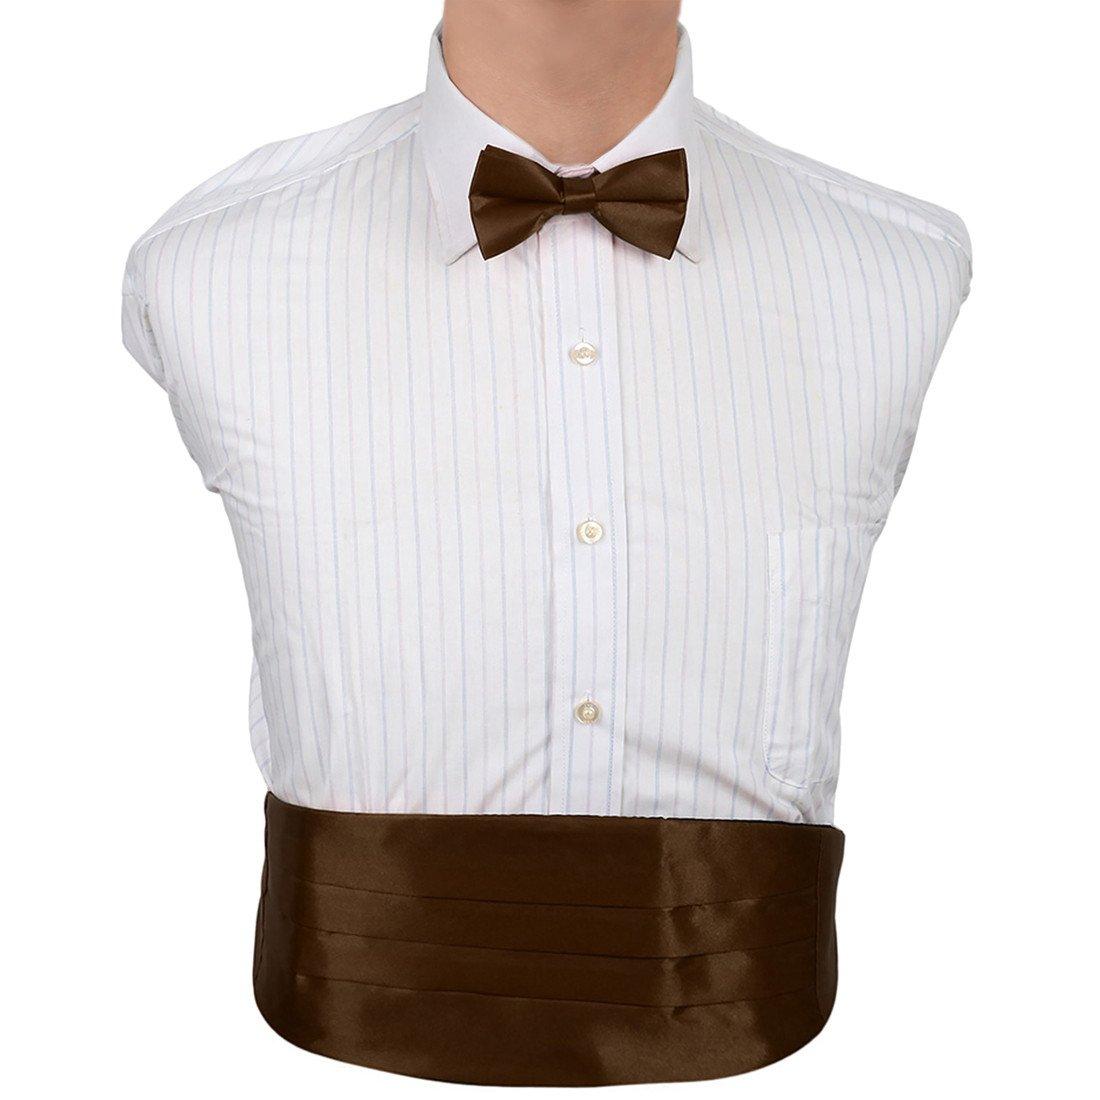 Dan Smith Mens Fashion Multicolored Solid Microfiber Best Cummerbund Bow Tie Set With Free Gift Box